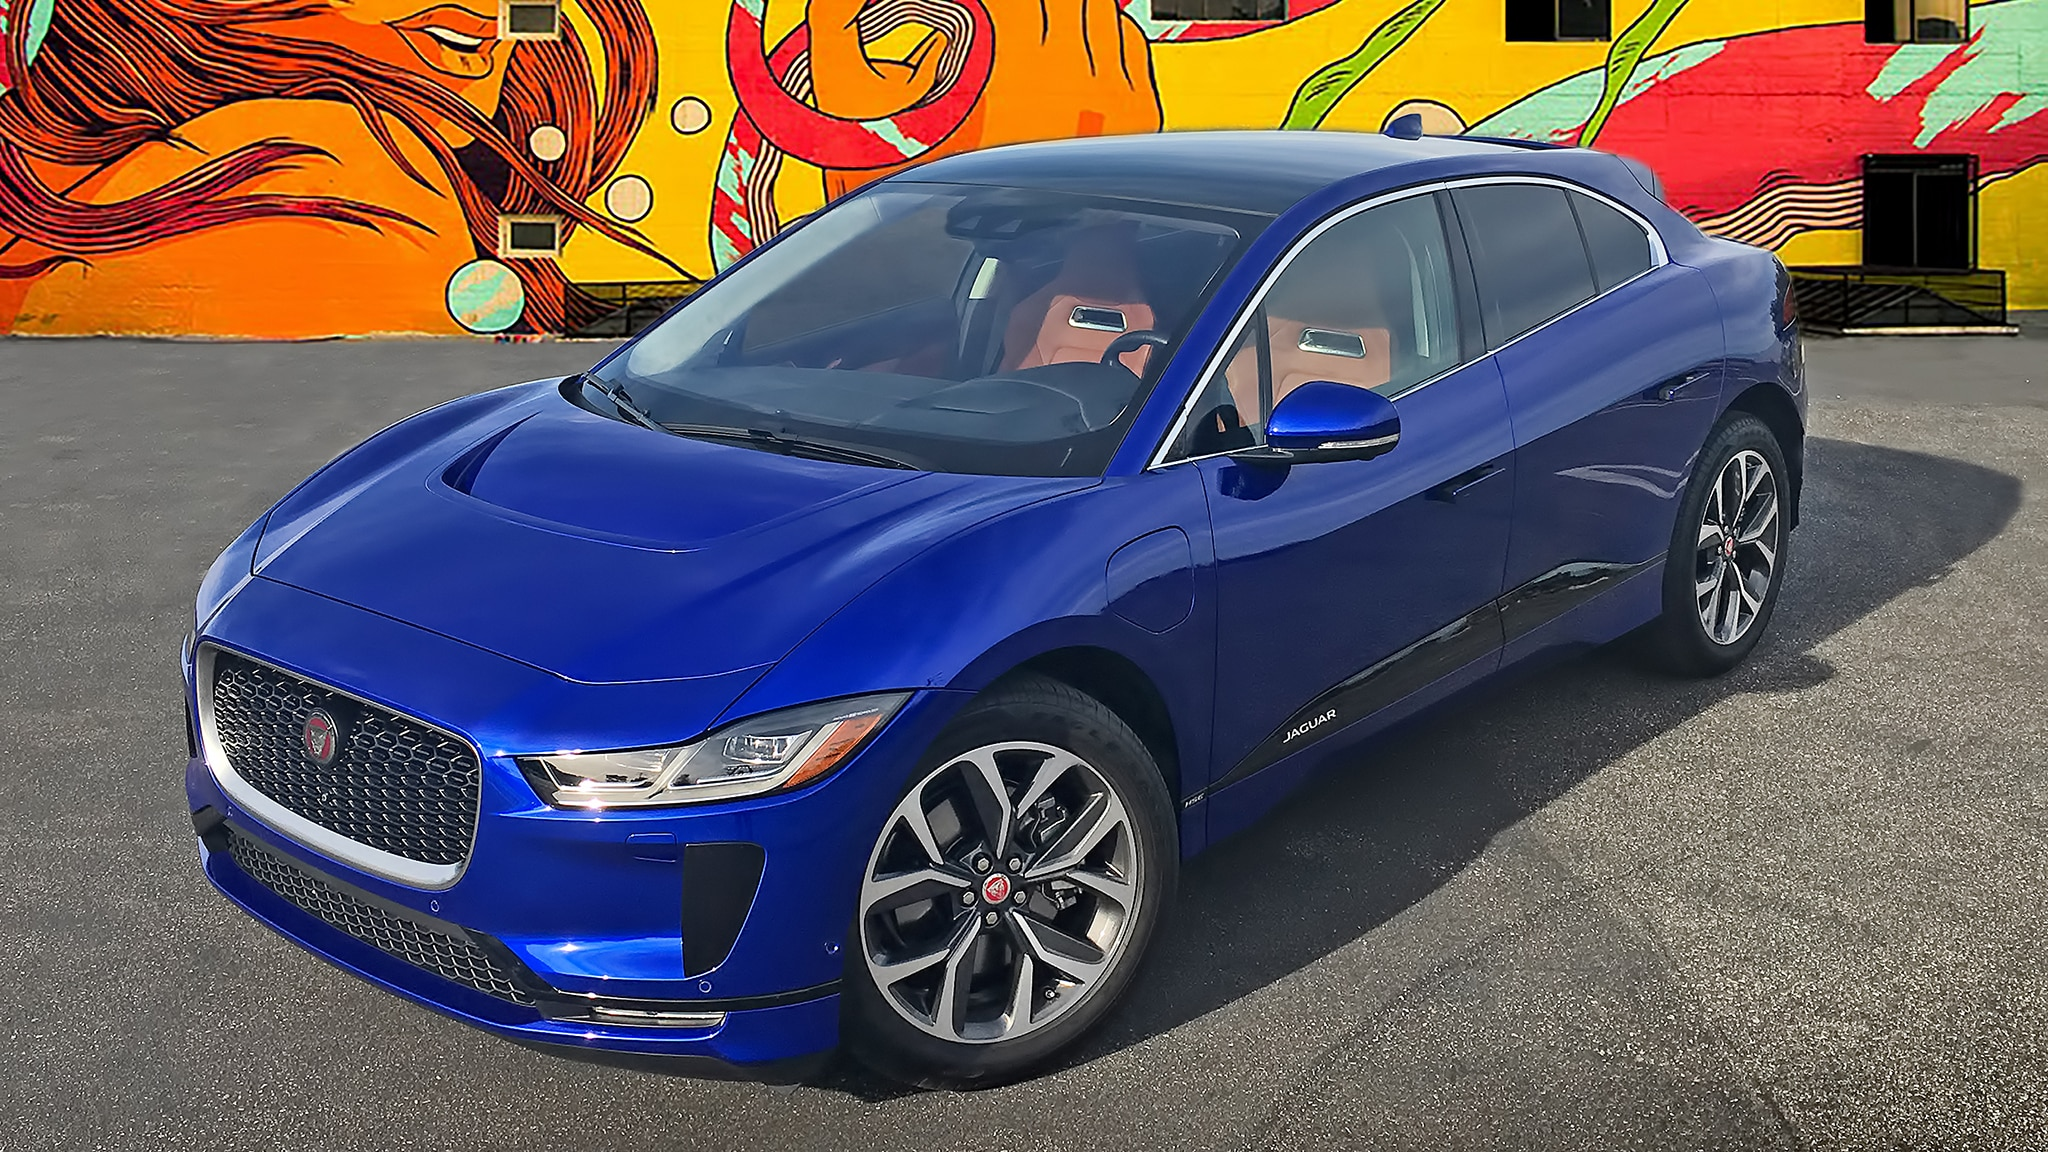 2019 Jaguar I Pace EV400 Blue